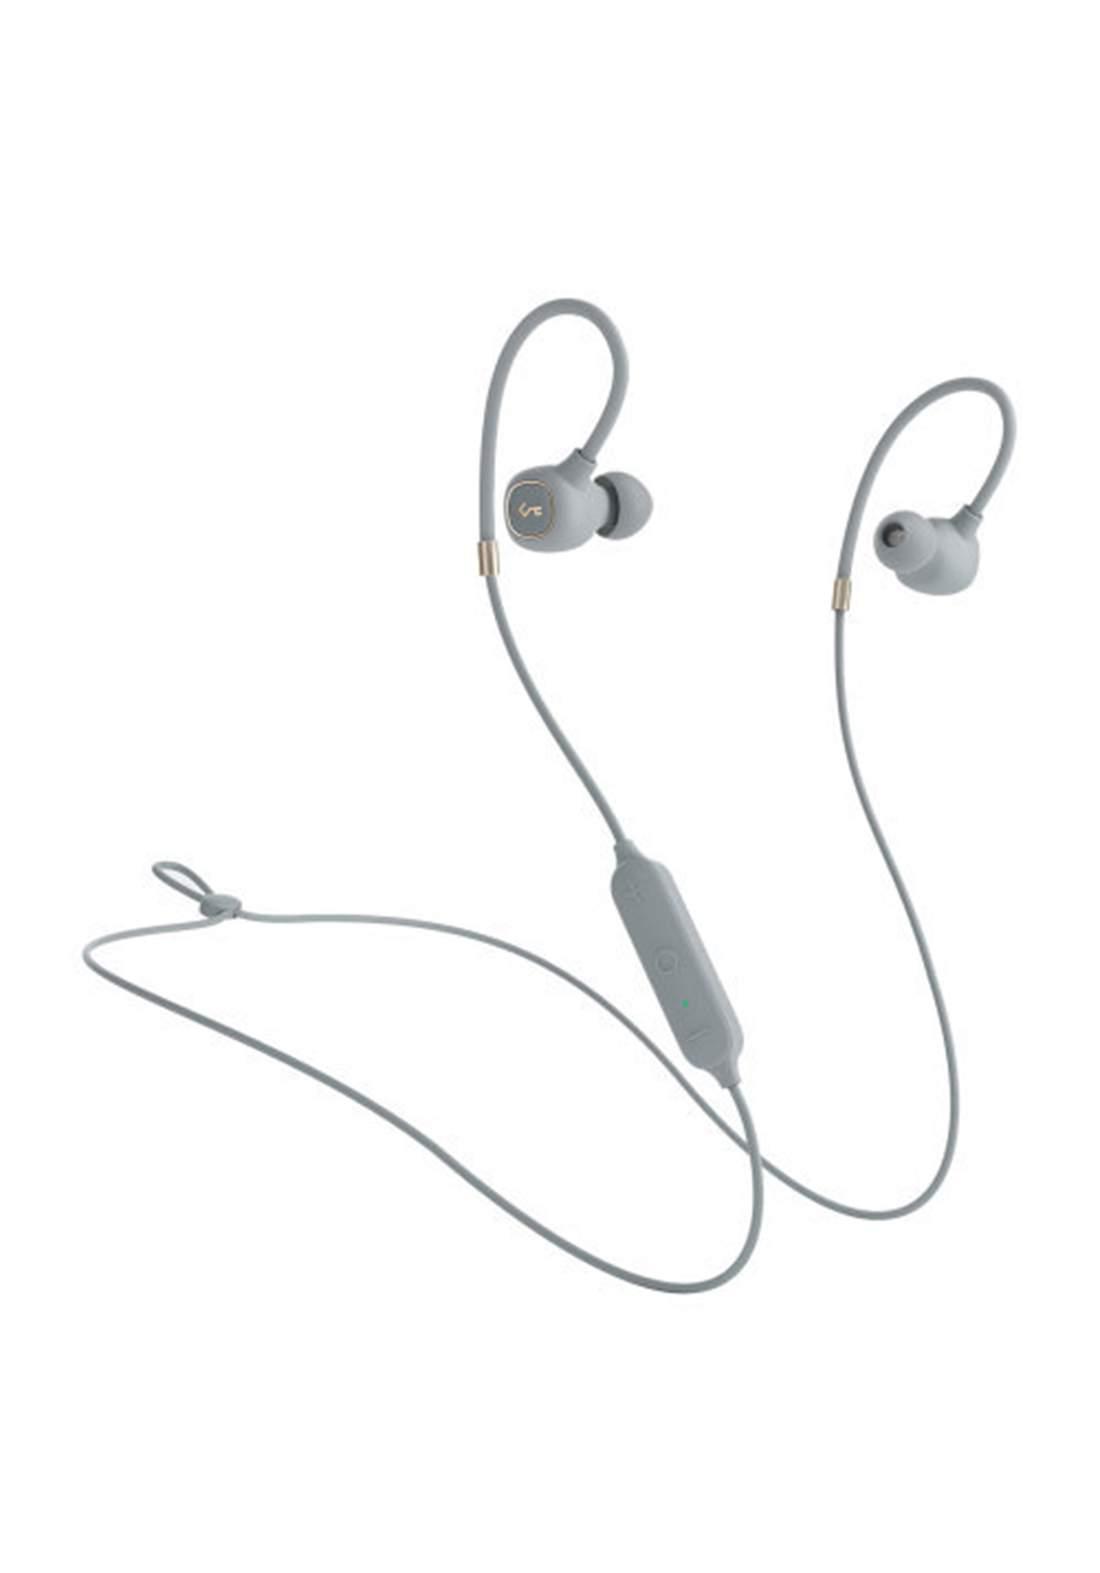 Aukey EP-B80  Hybrid Dual-Driver Wireless Earbuds -  Gray  سماعة